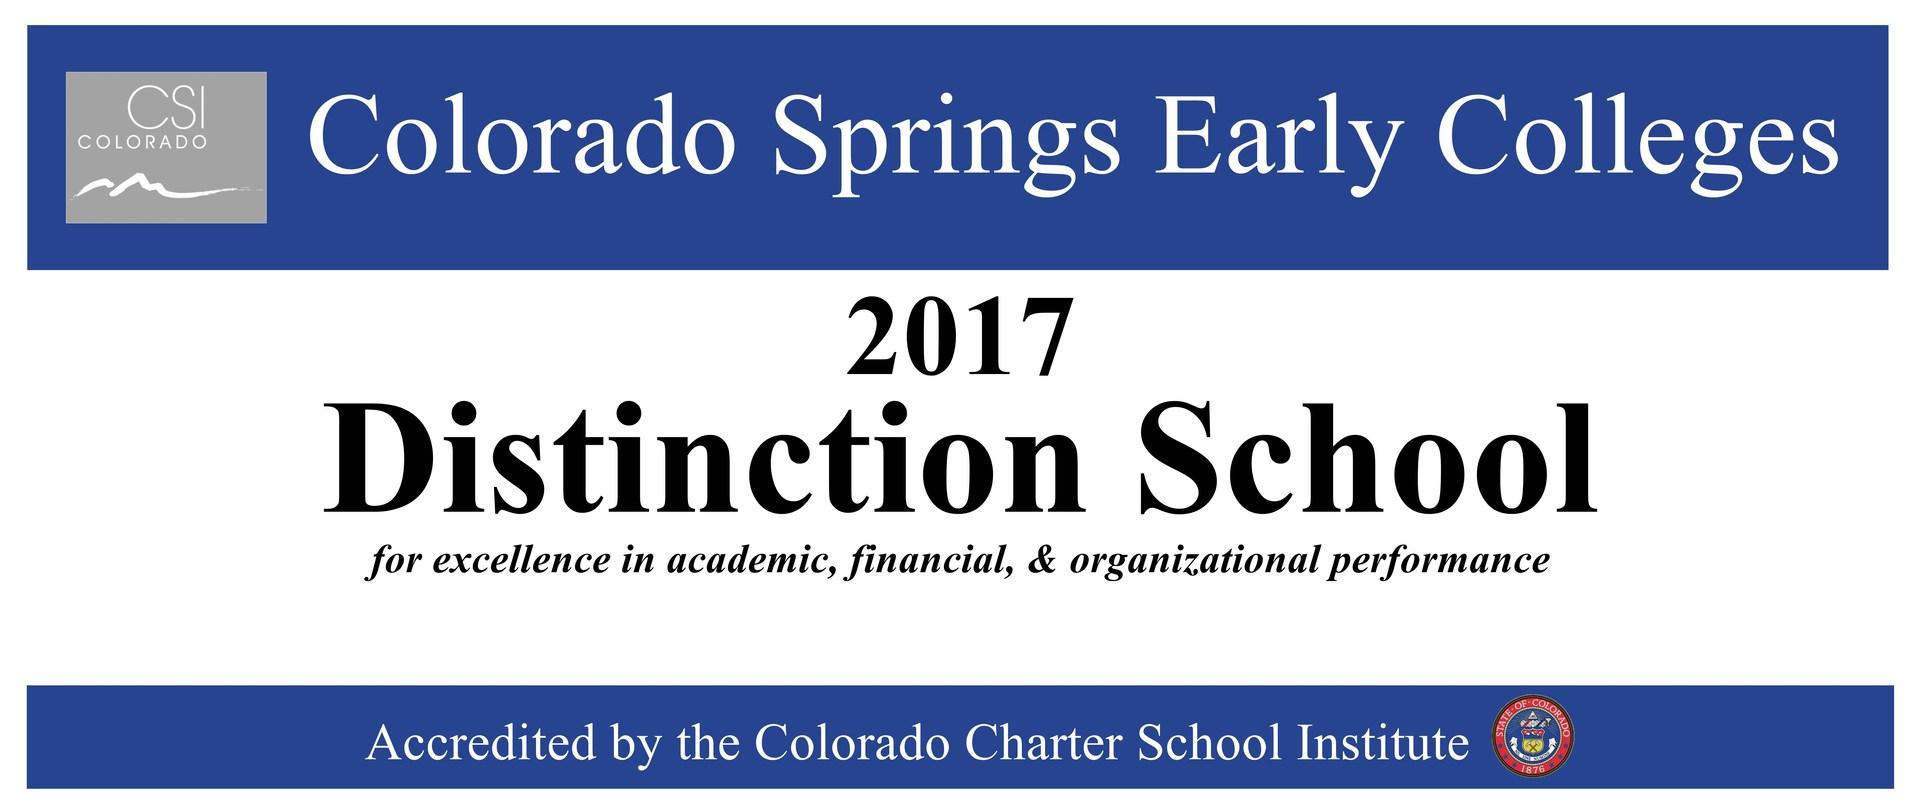 School of Distinction Award 2017